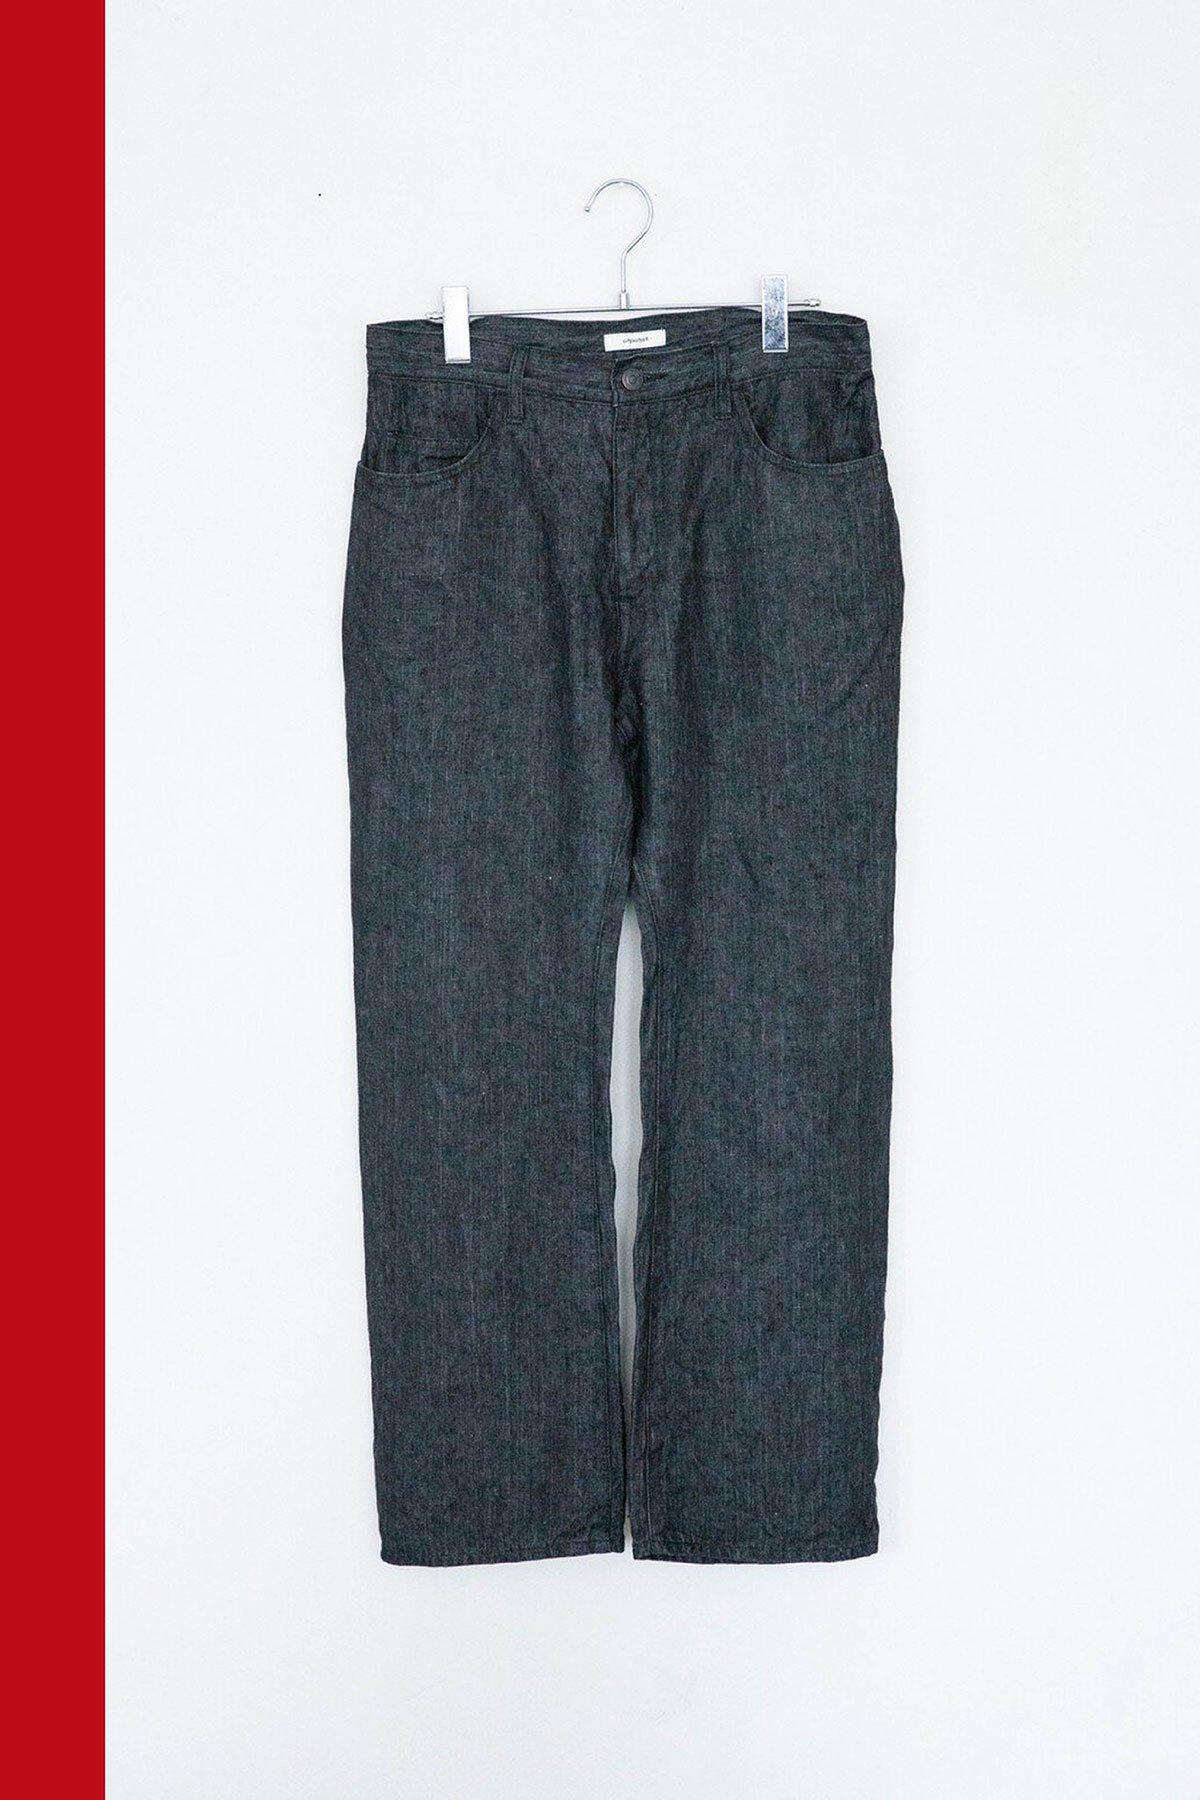 whowhat / LINEN DENIM SLIM FLARE PANTS (BLACK)